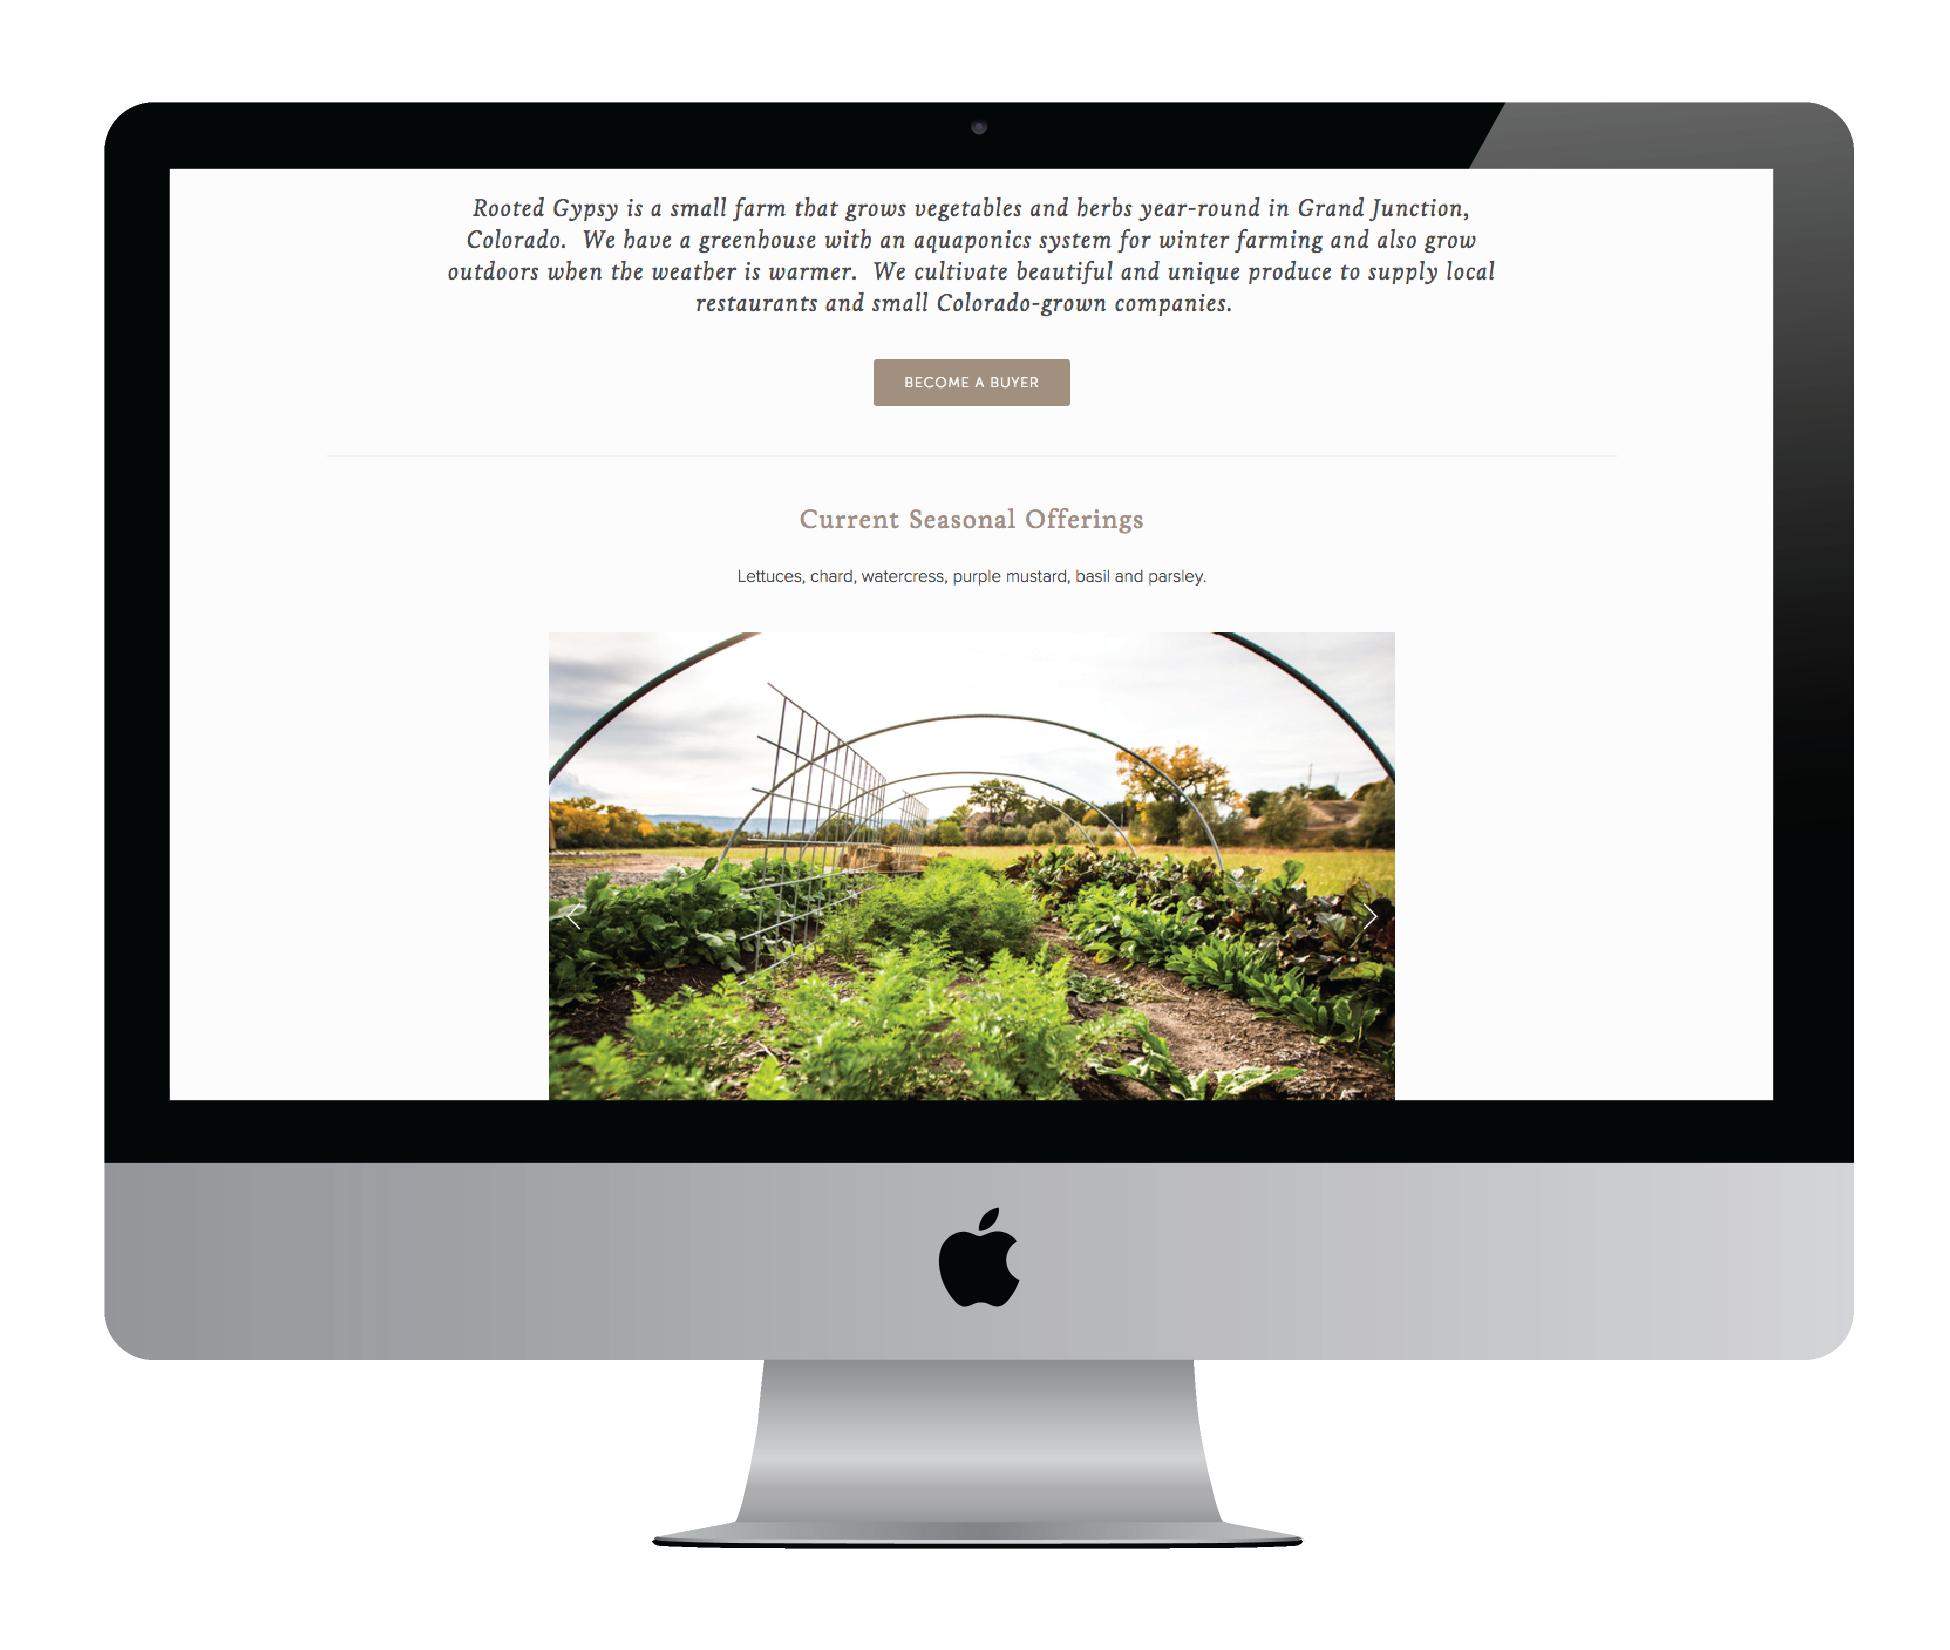 Rooted Gypsy Farms - Farm Food - Eva Moon Press